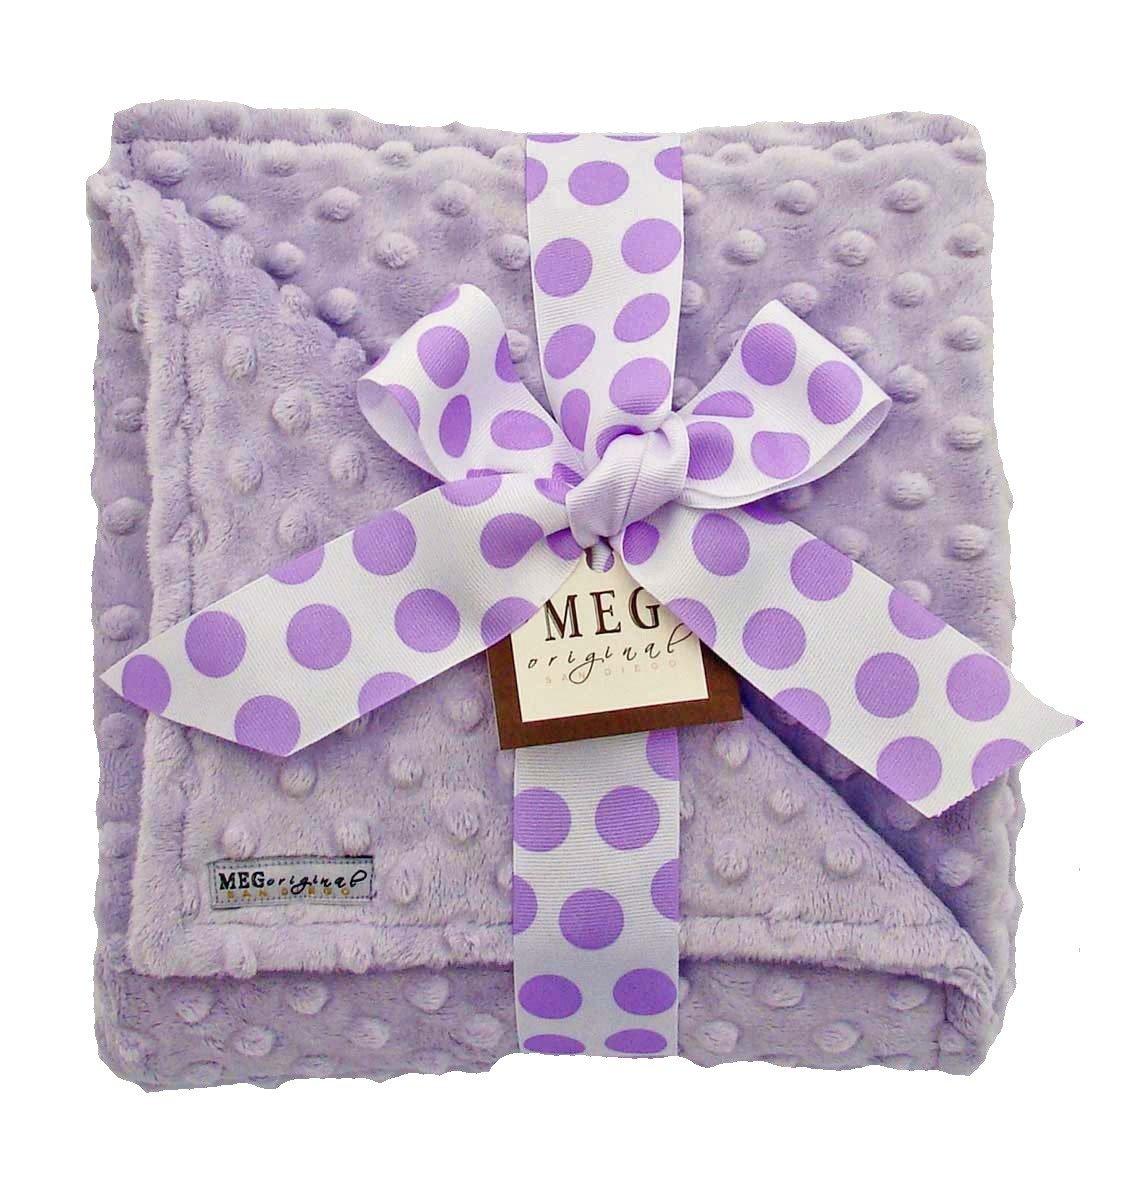 Meg Original Lavender Minky Blanket by MEG Original   B0087SHDQ6